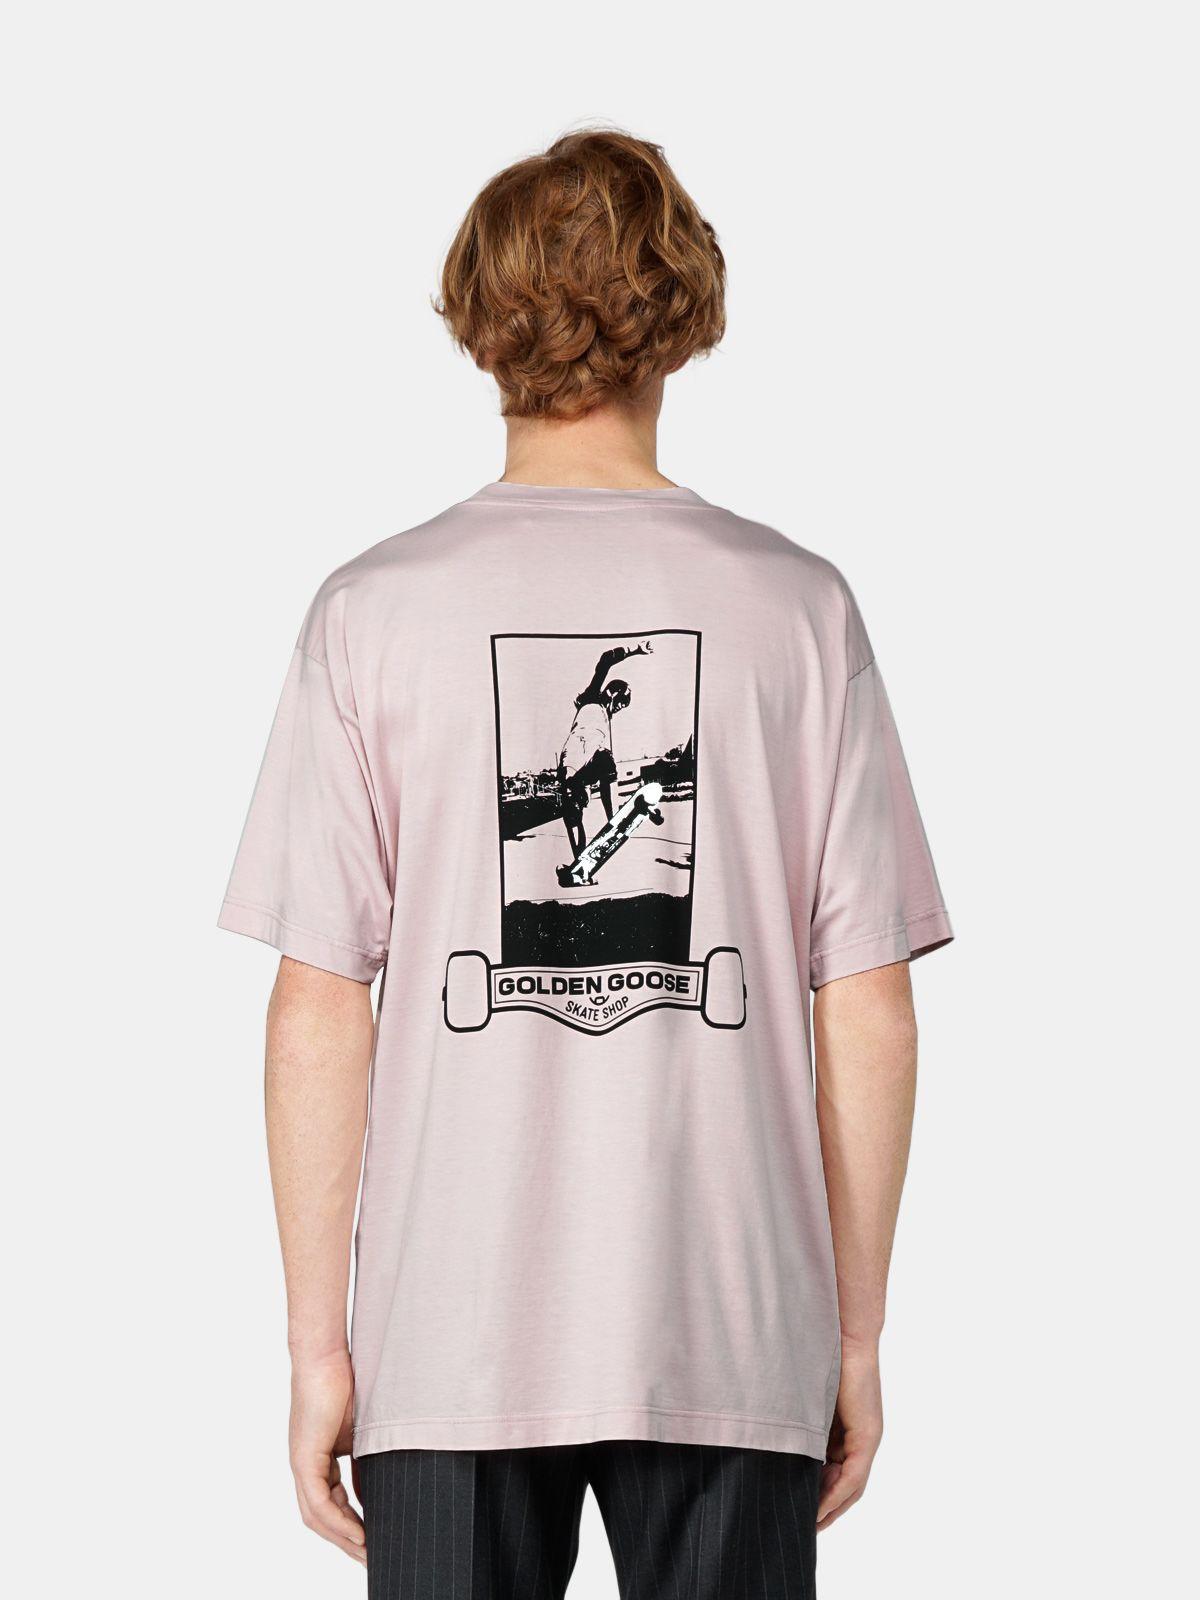 Golden Goose - Artù oversize T-shirt with skateboard print in